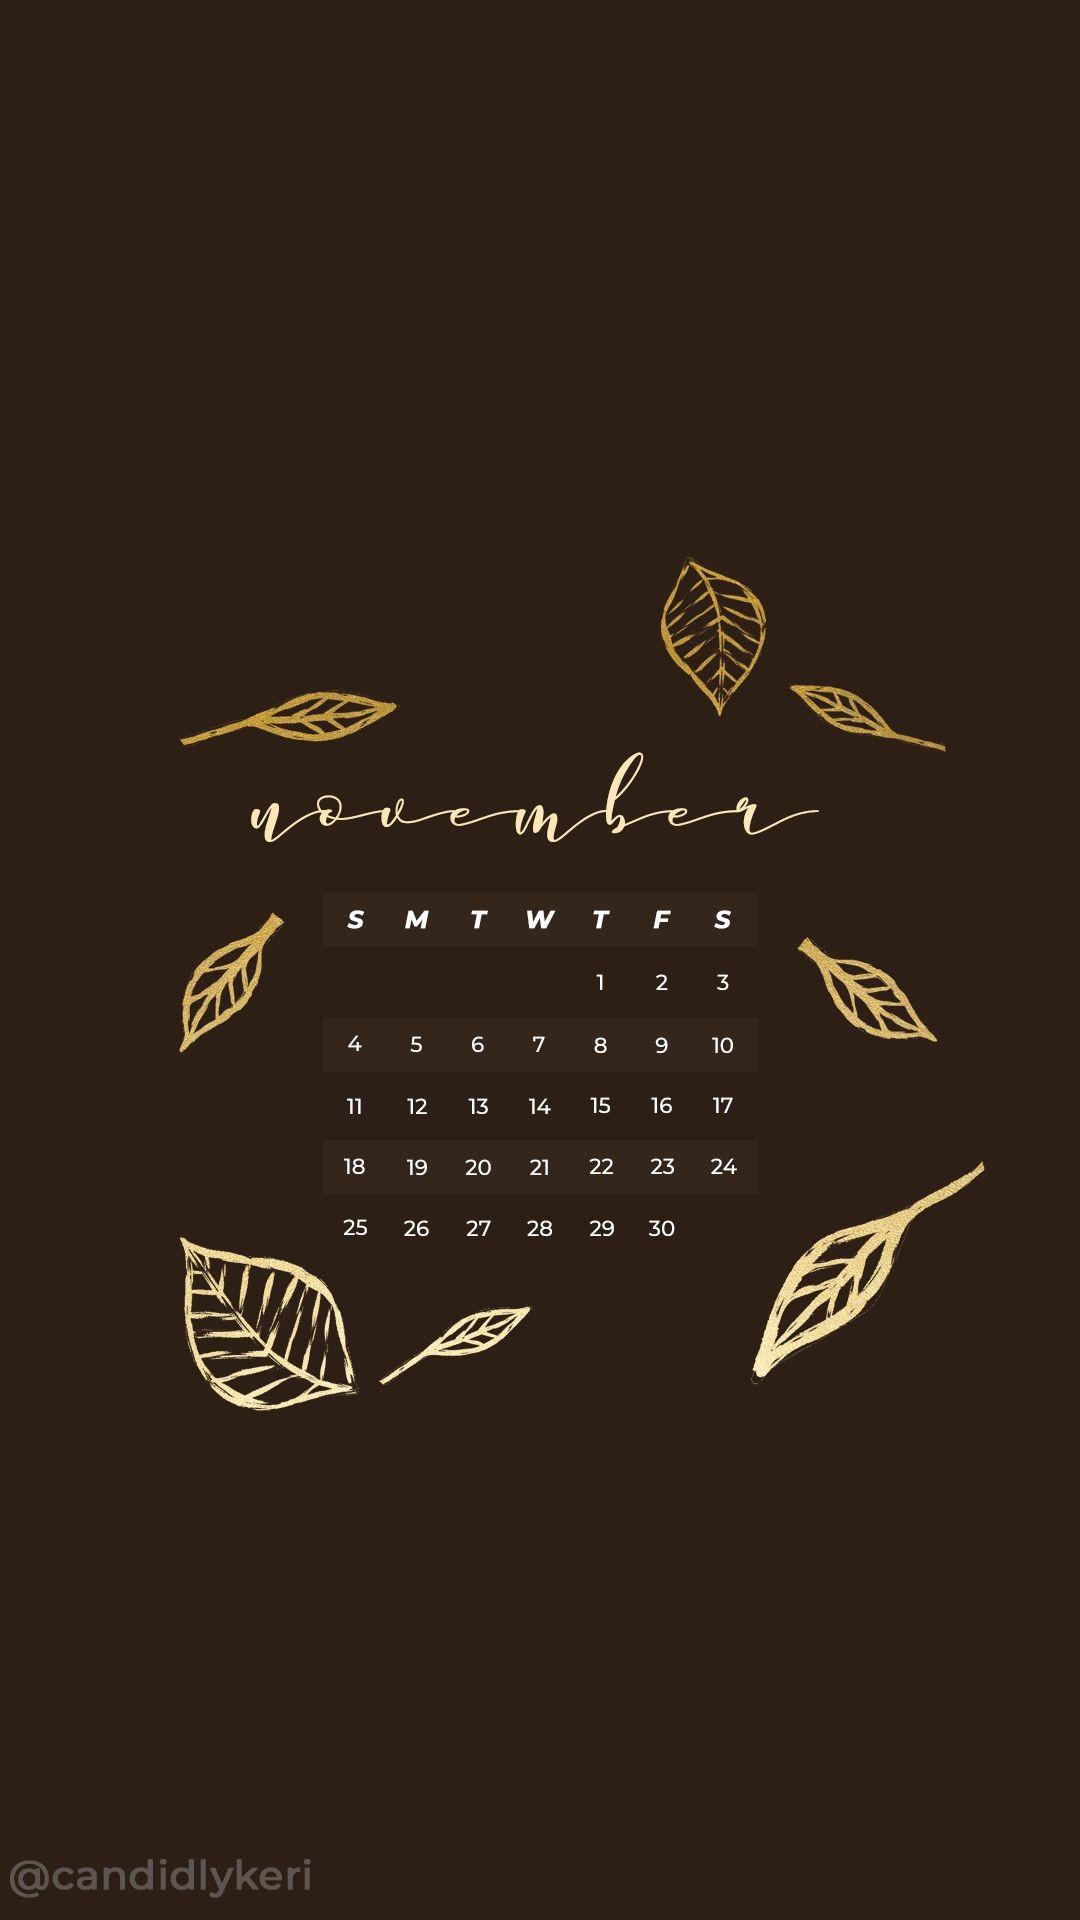 March Calendar Calligraphy Más Arriba-a-fecha Pin by Saimsmia On Calendar Pinterest Of March Calendar Calligraphy Más Recientes 007 Blank Calendar Printable Template March Excel Uohrjx Tweyig Free